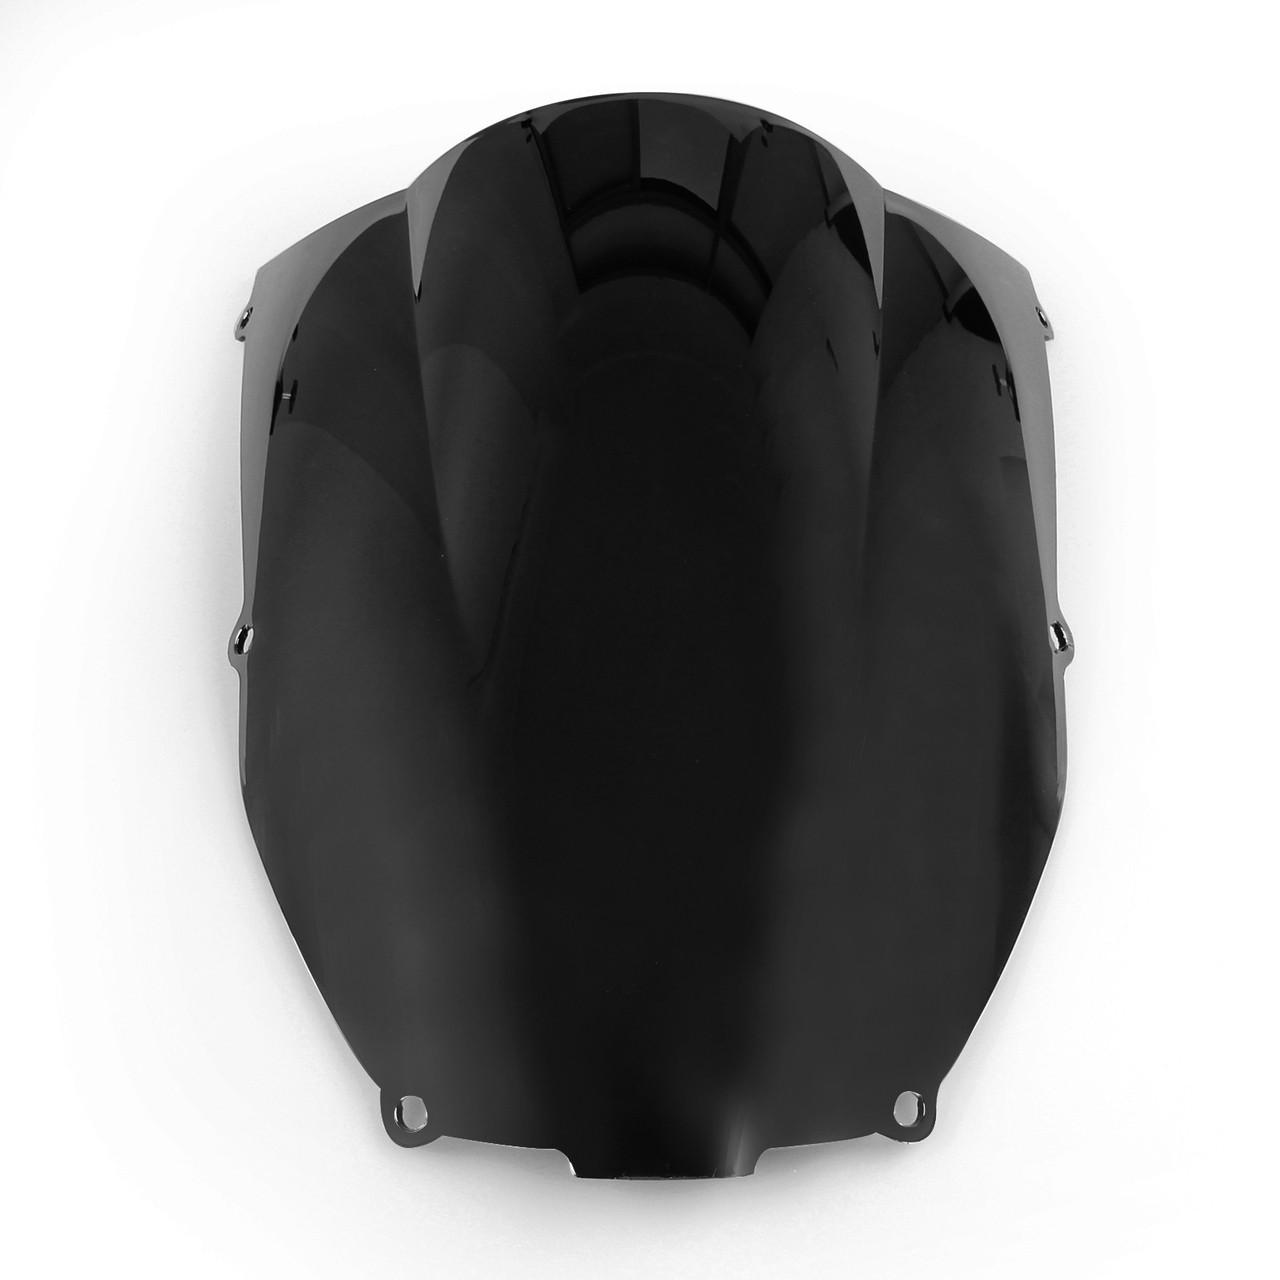 http://www.madhornets.store/AMZ/MotoPart/Windshield/Kawasaki/WIN-K214/WIN-K214-Black-1.jpg